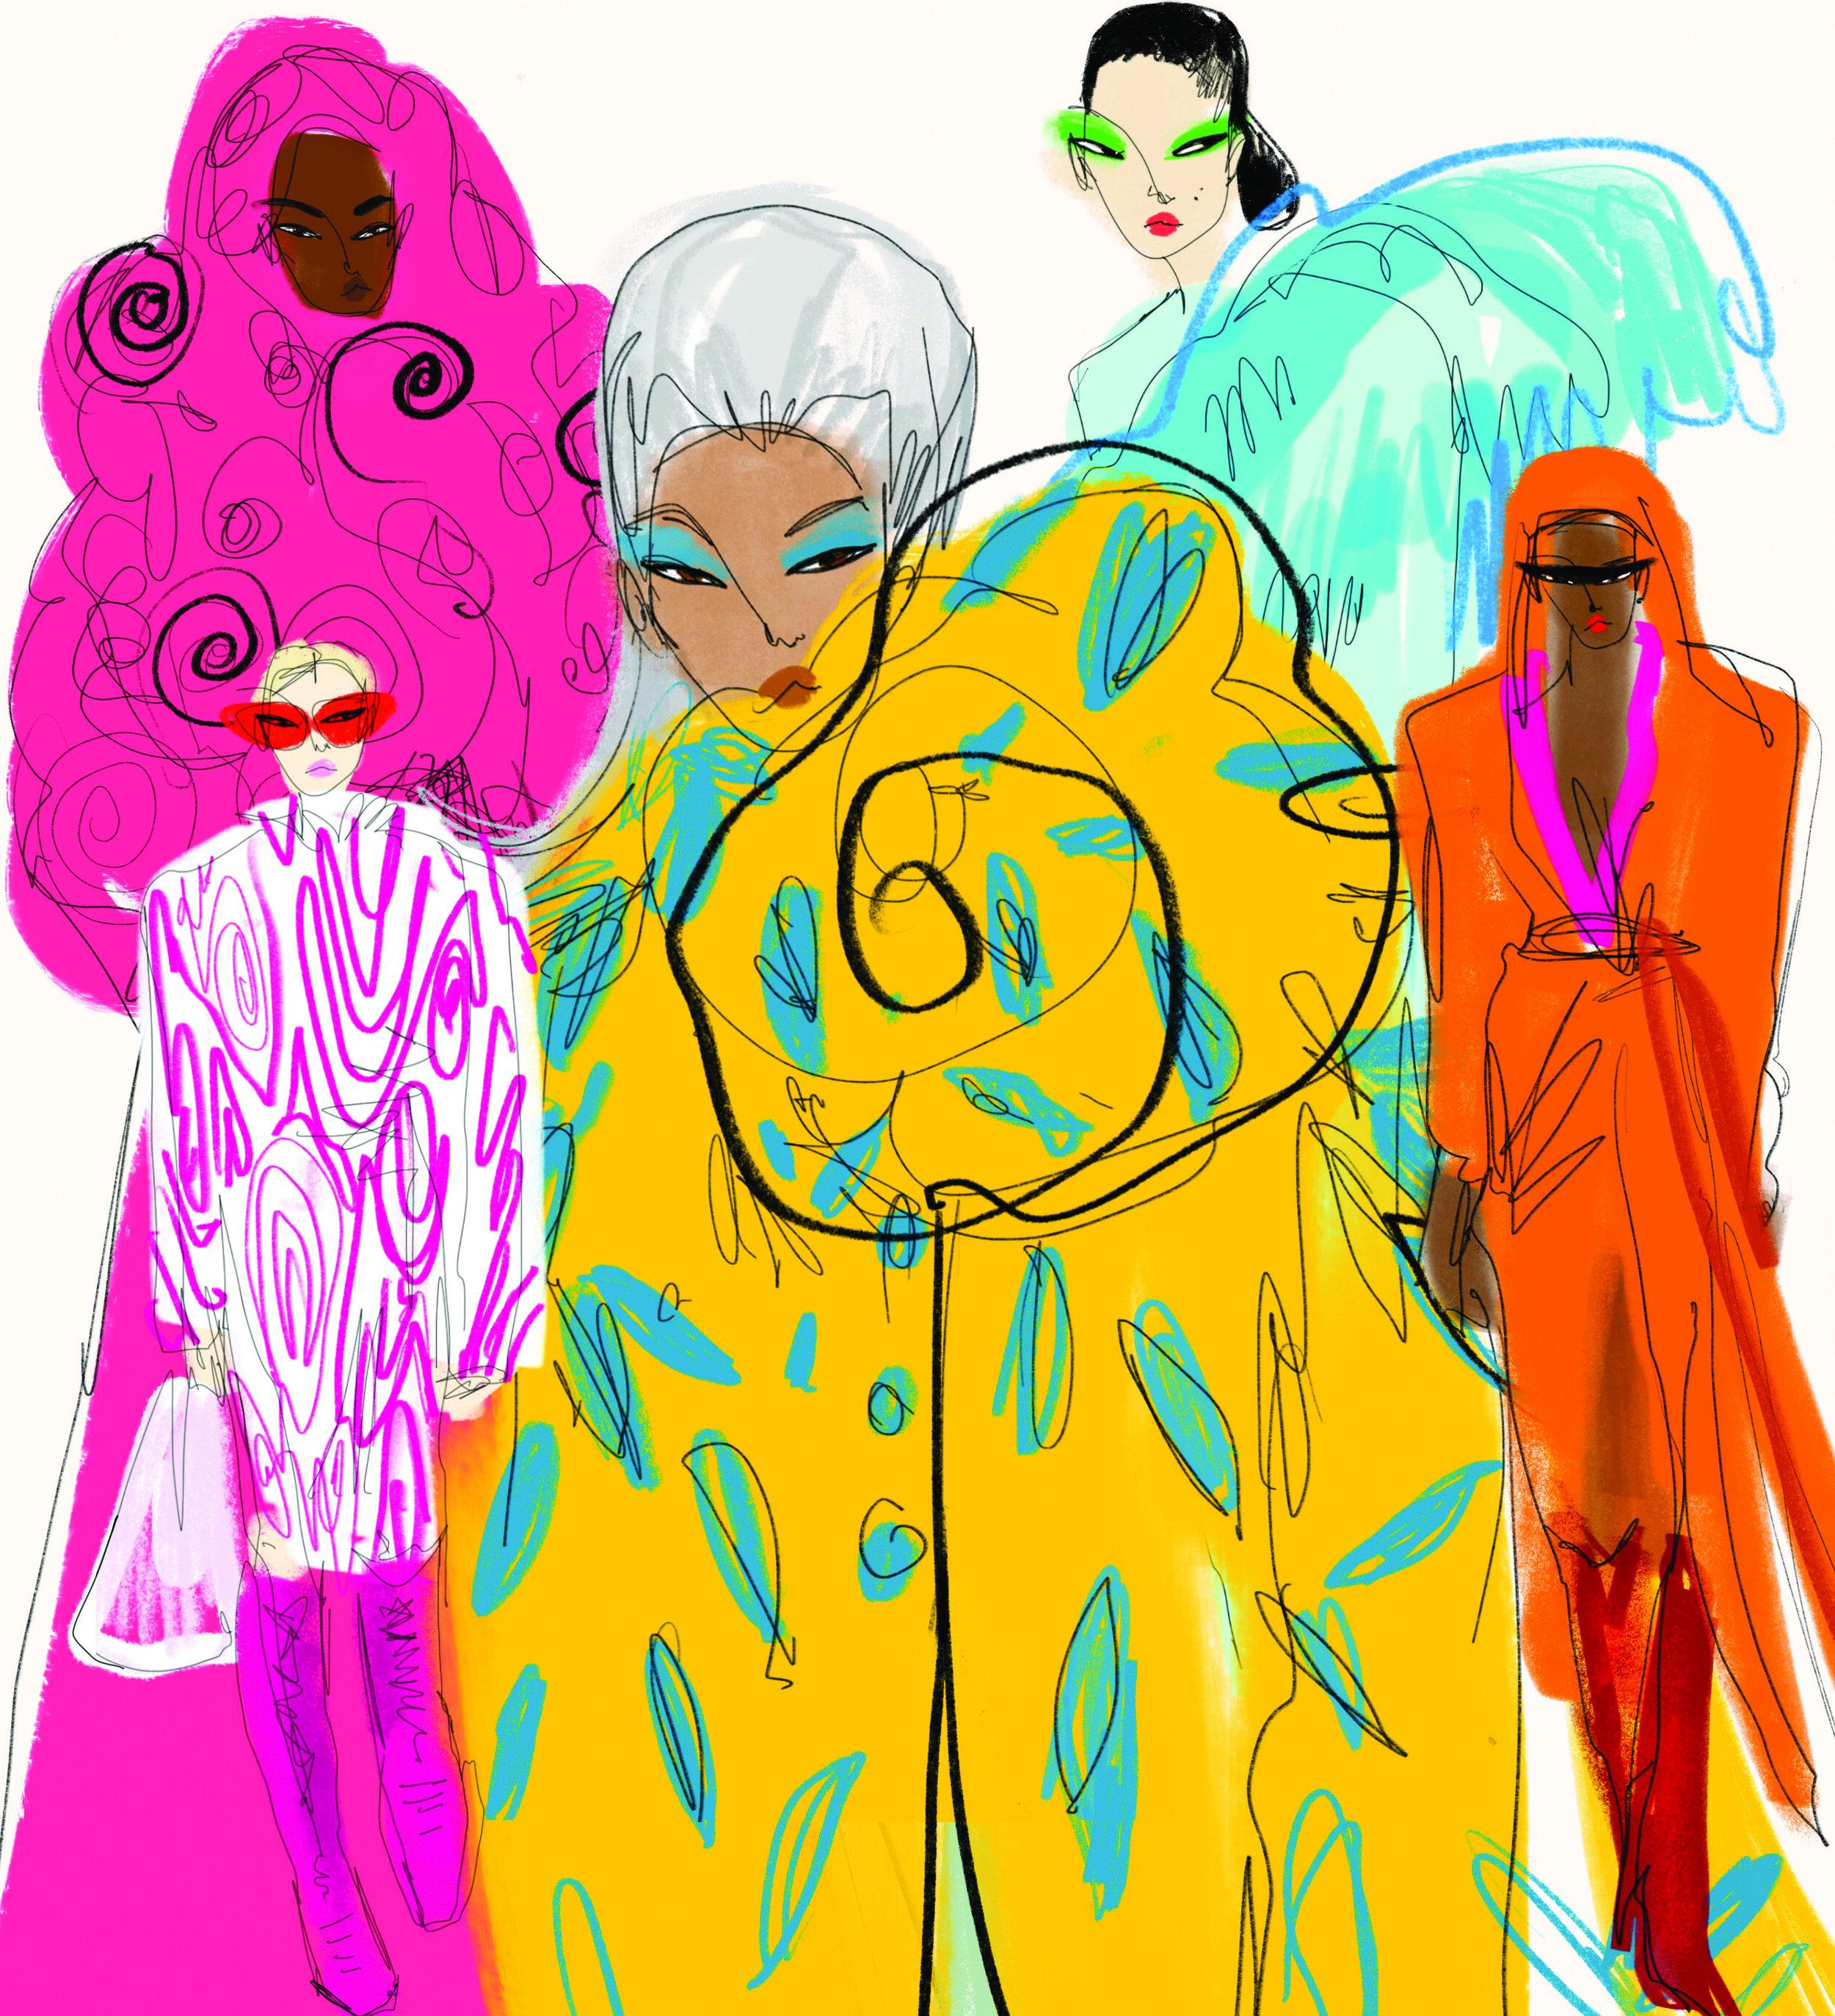 Fashion Forward - Illustrations by ANJELICA ROSELYN